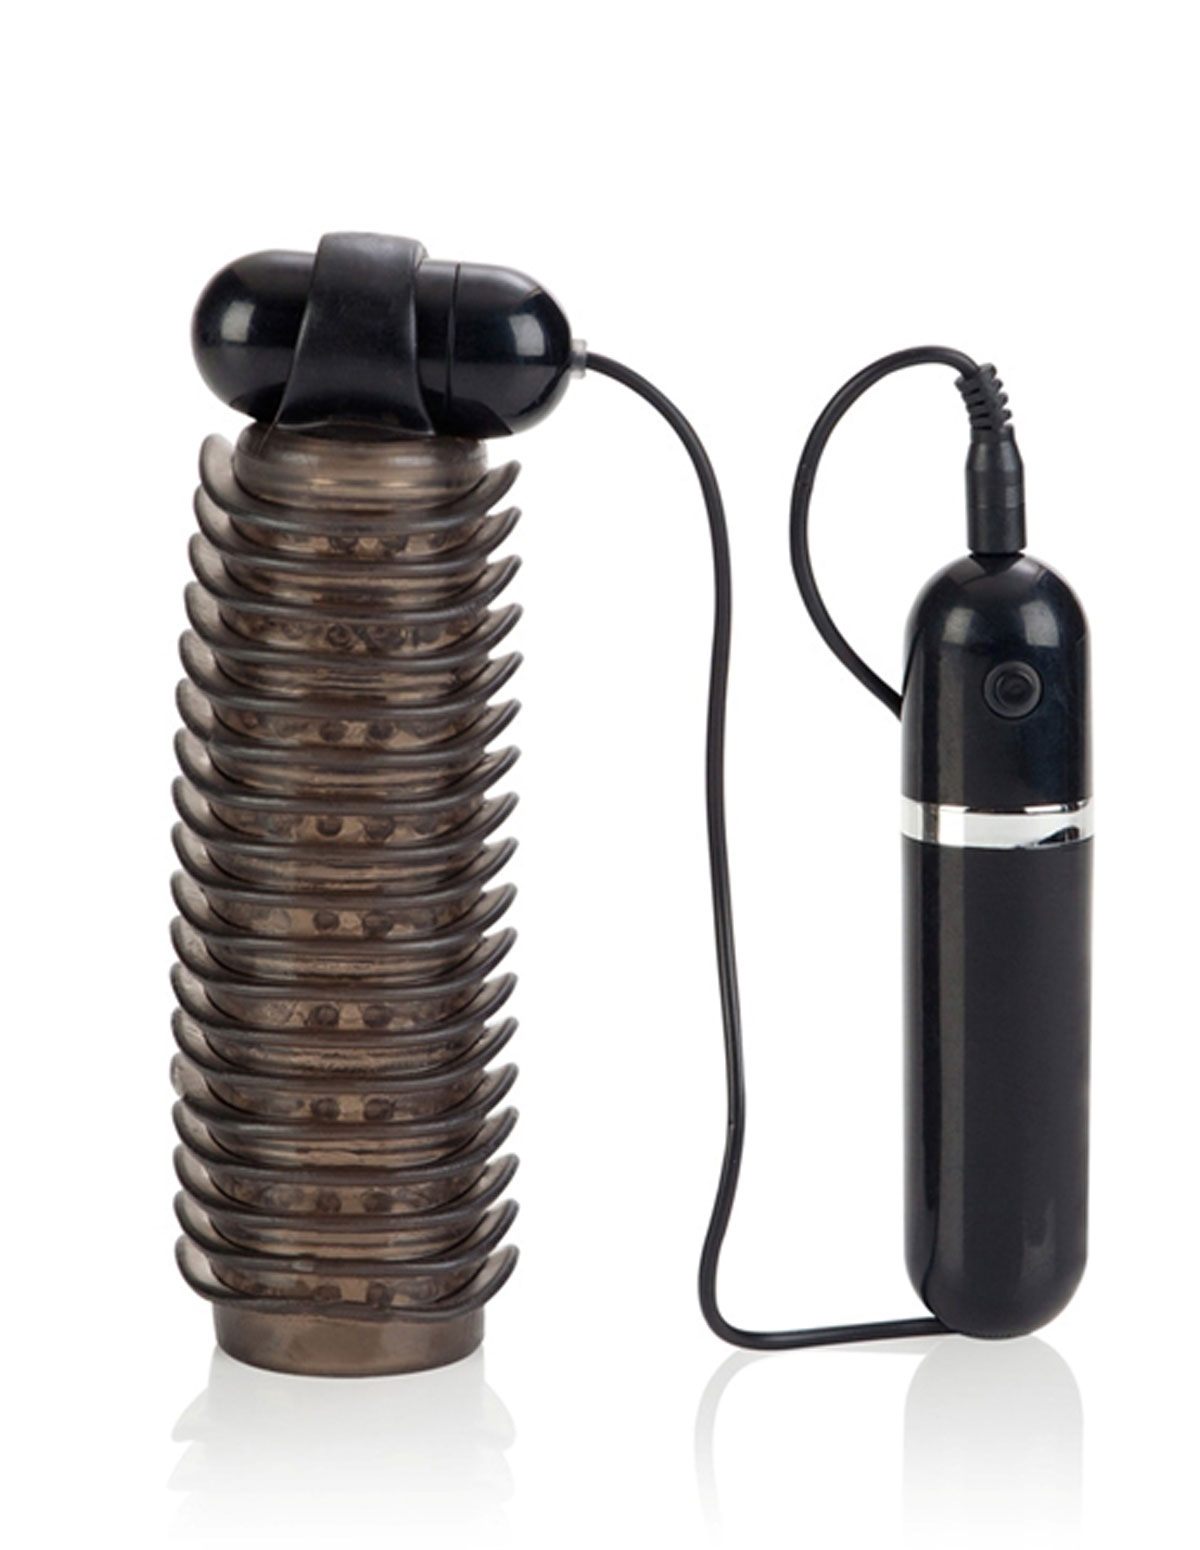 10Func Adonis Vibrating Stroker